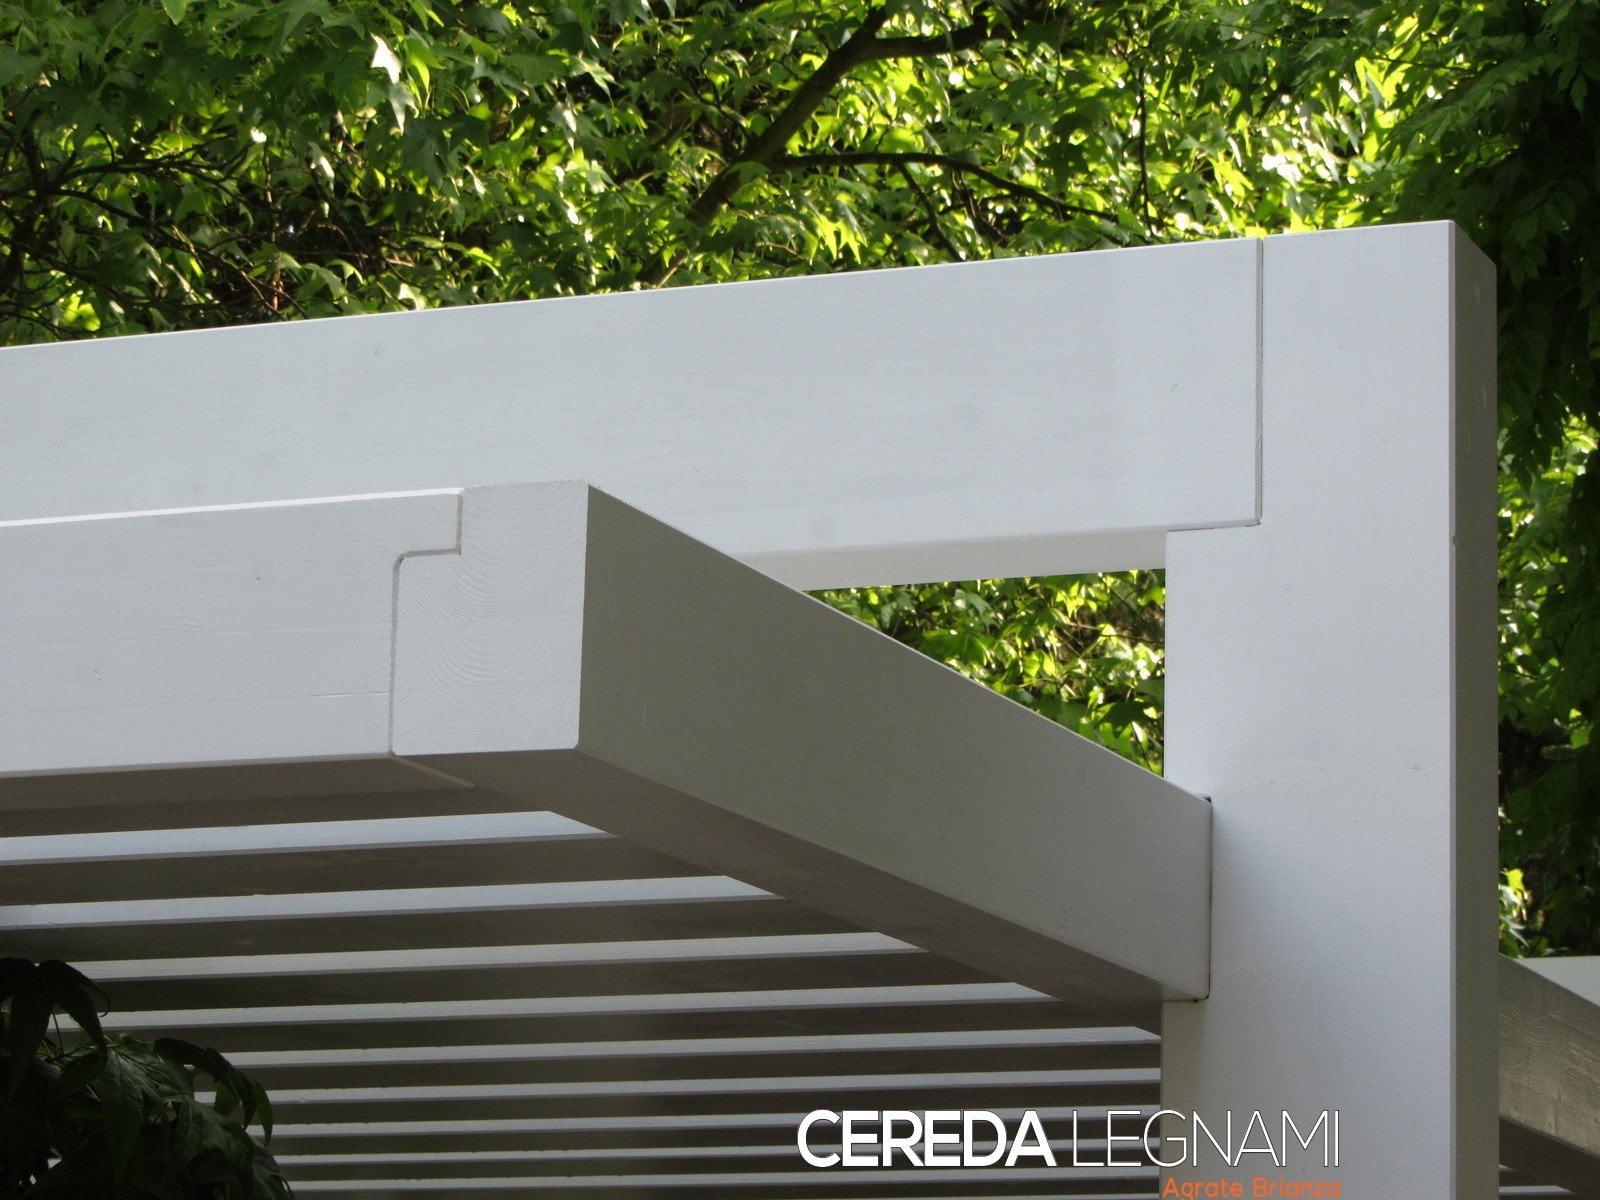 Pergola design   cereda legnami agrate brianza